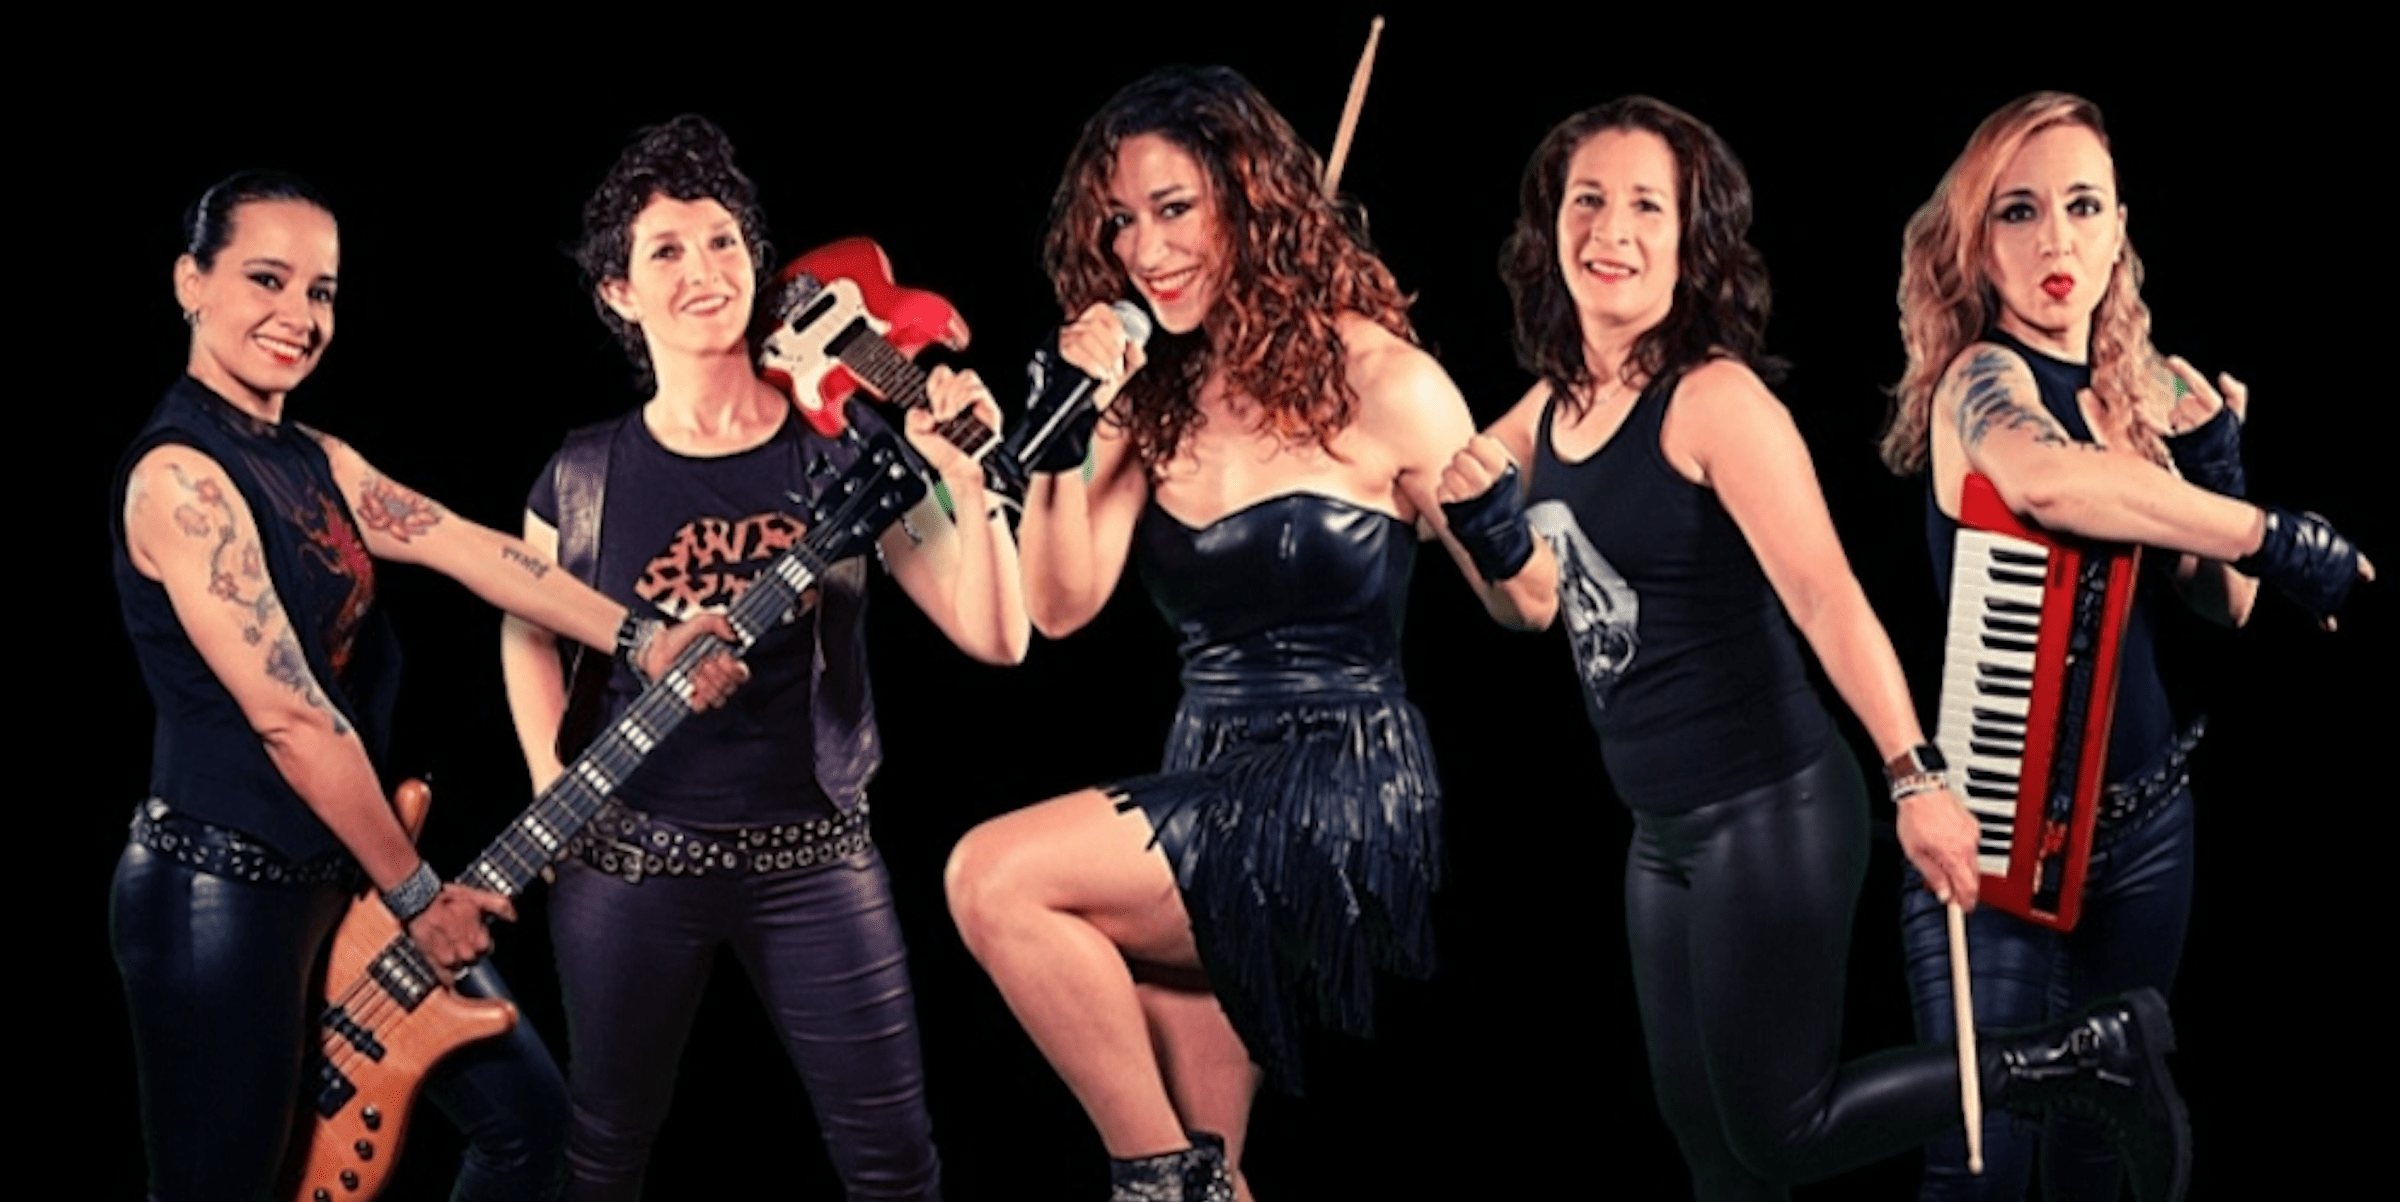 The Rocking Ladies